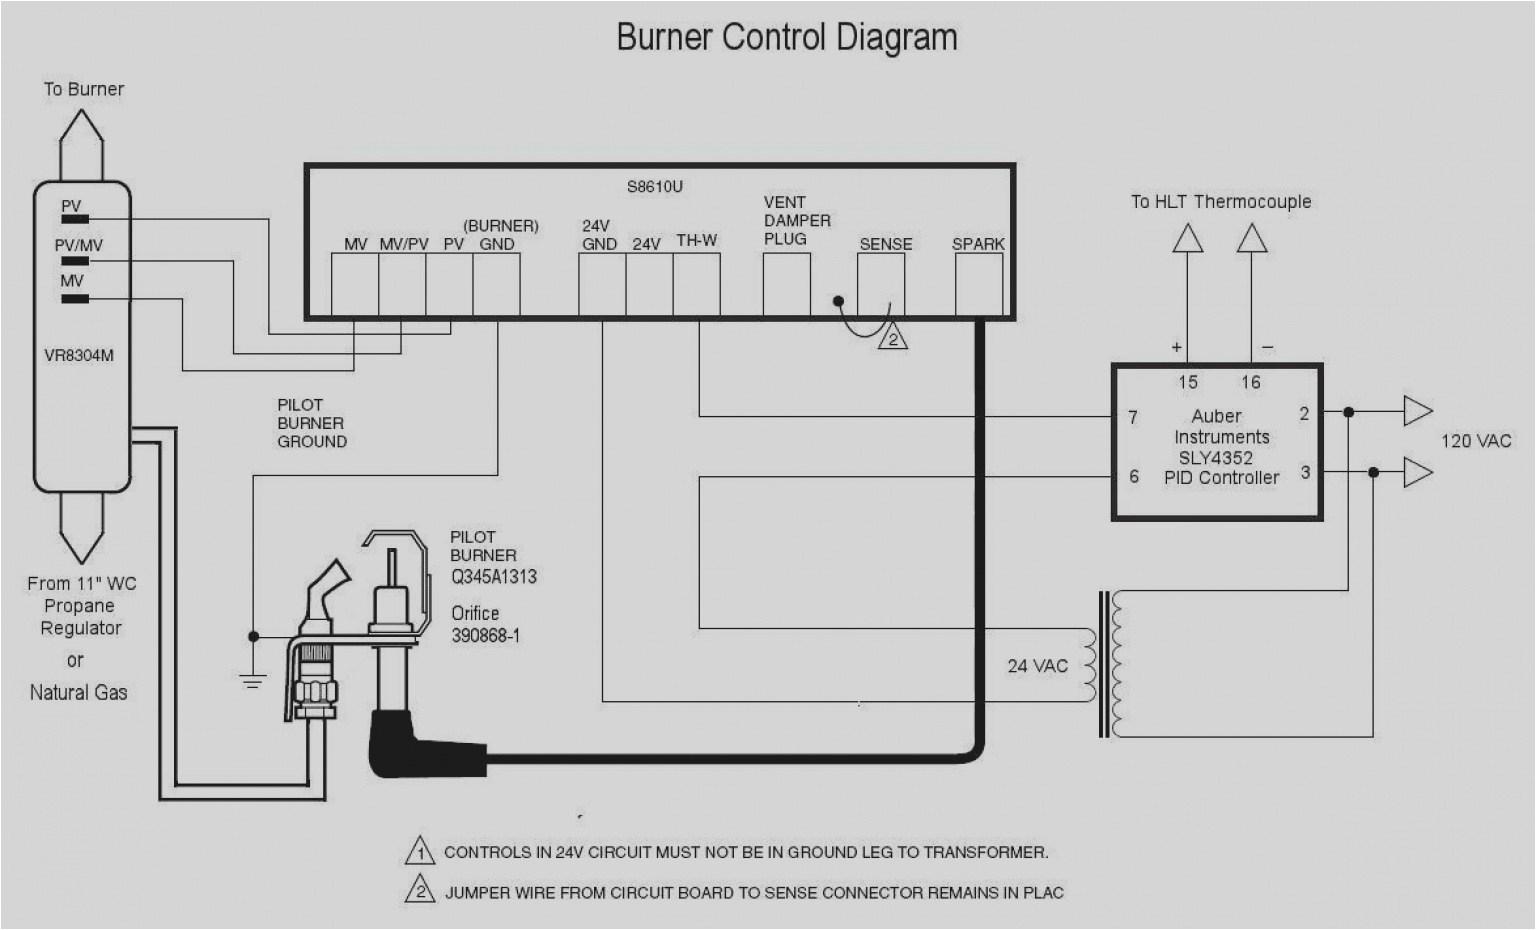 honeywell st9120c4057 wiring diagram honeywell programmable thermostat wiring diagram emprendedorlink rh 208 167 249 254 honeywell control board st9120u1011 furnace 17p jpg